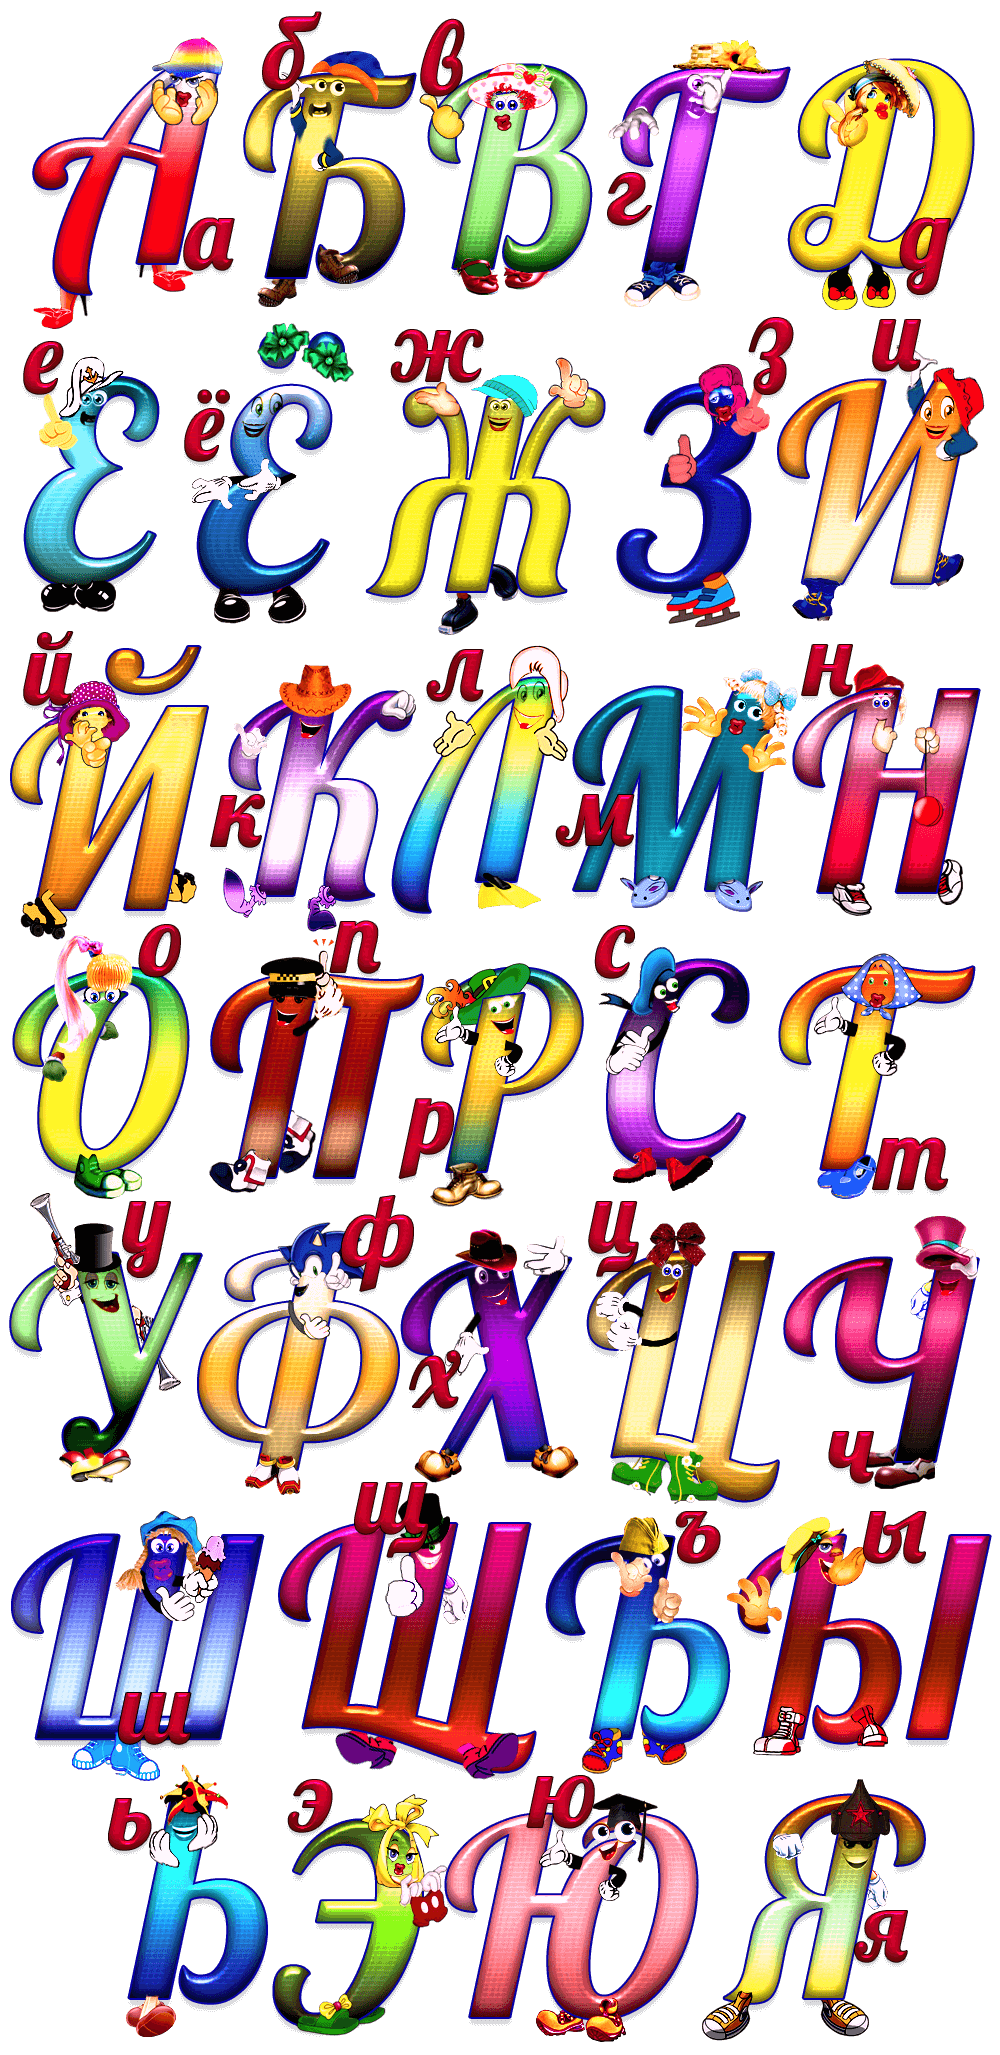 азбука русская шаблон